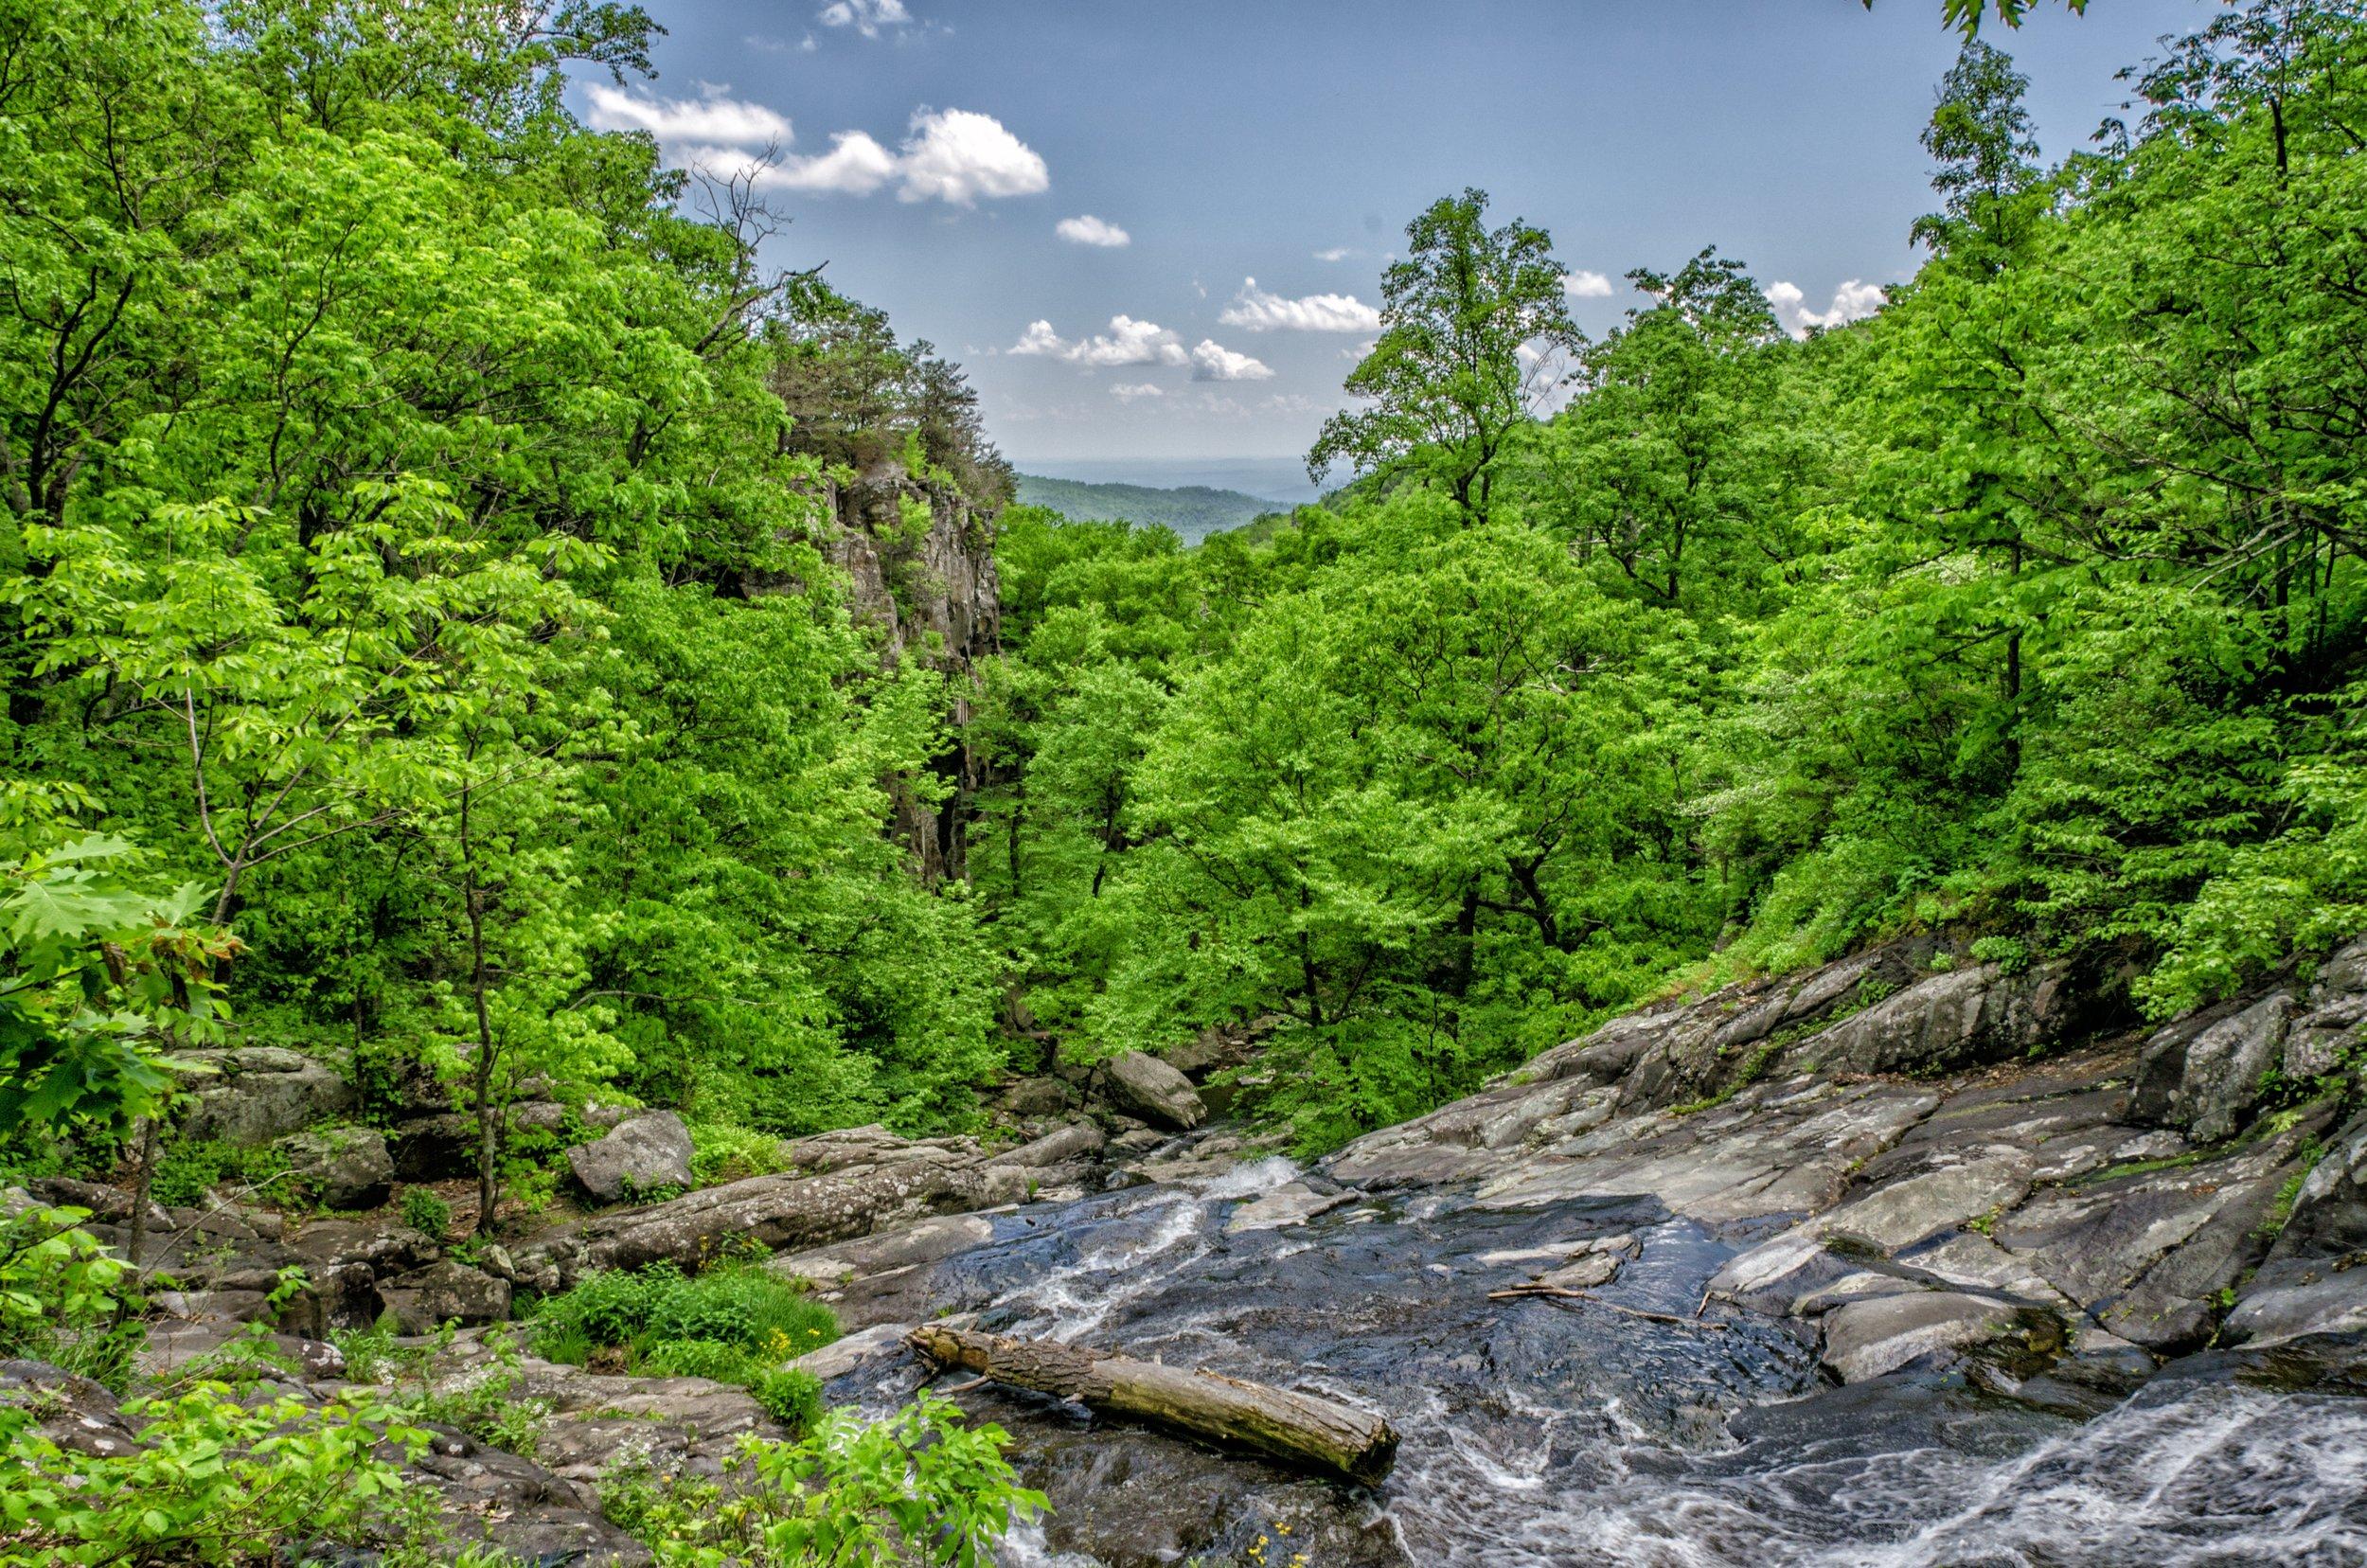 unsplash_mountain_stream_trees_JAdney.jpg